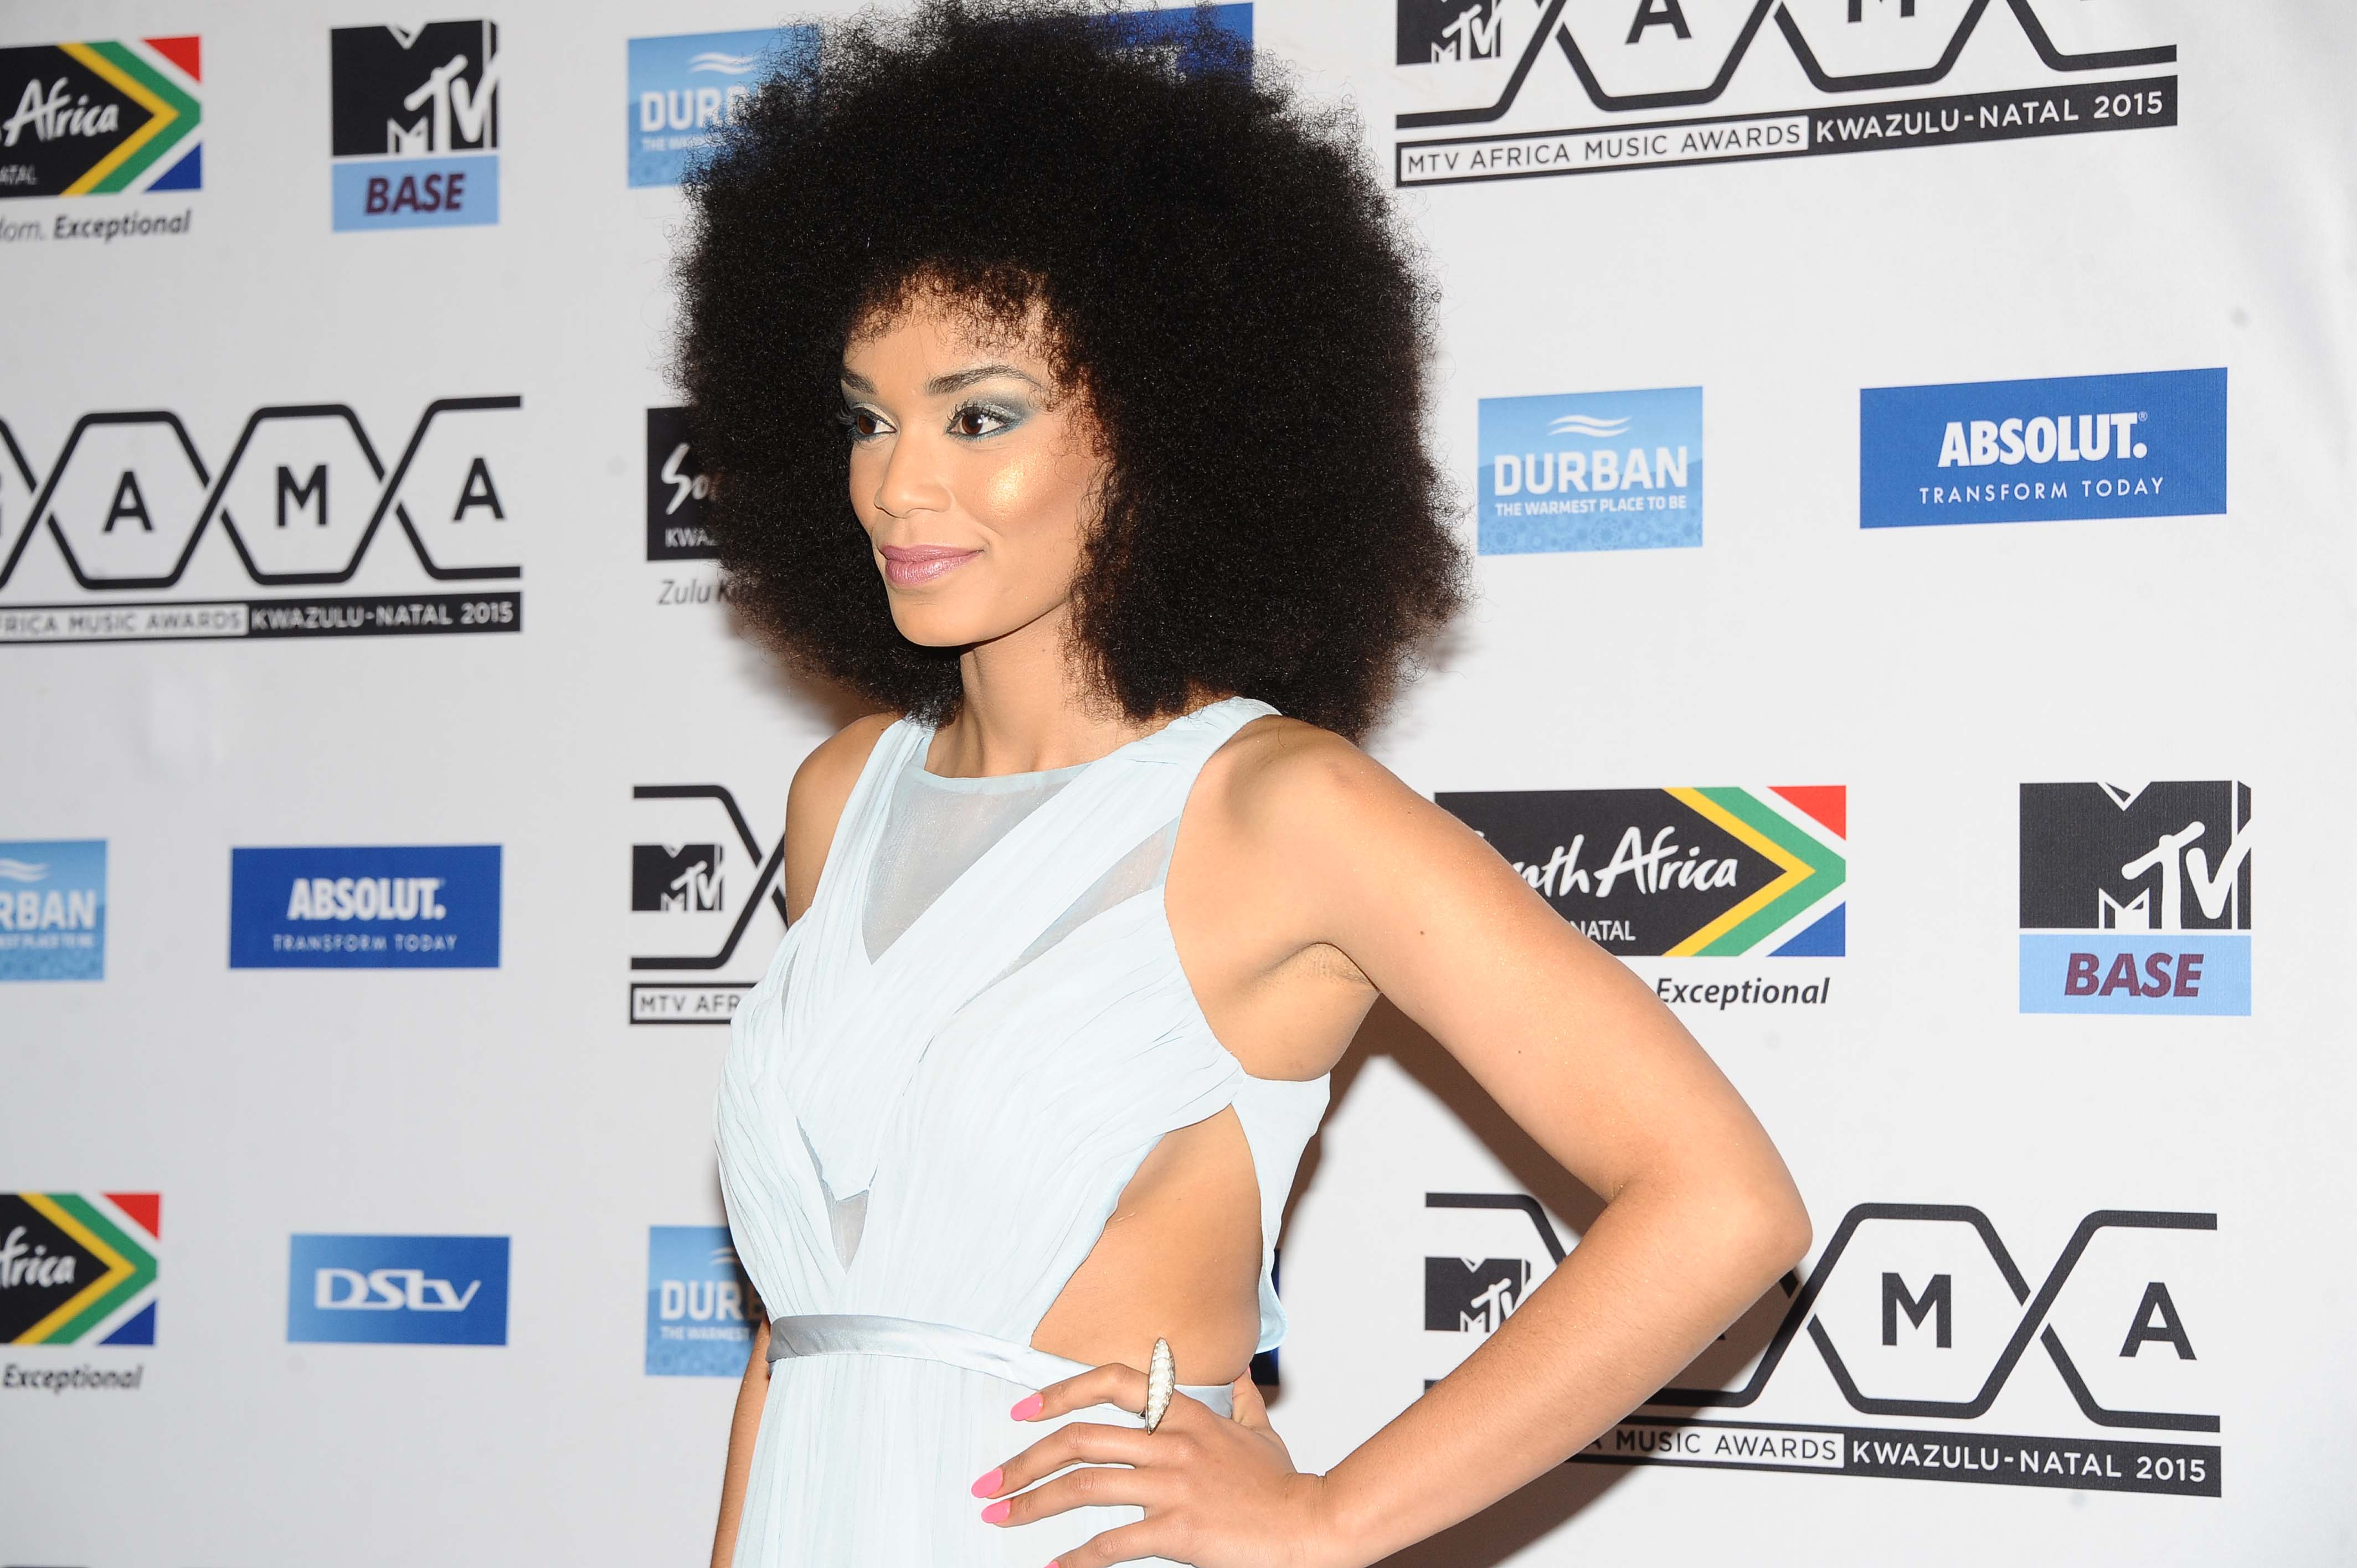 2015 MTV Africa Music Awards